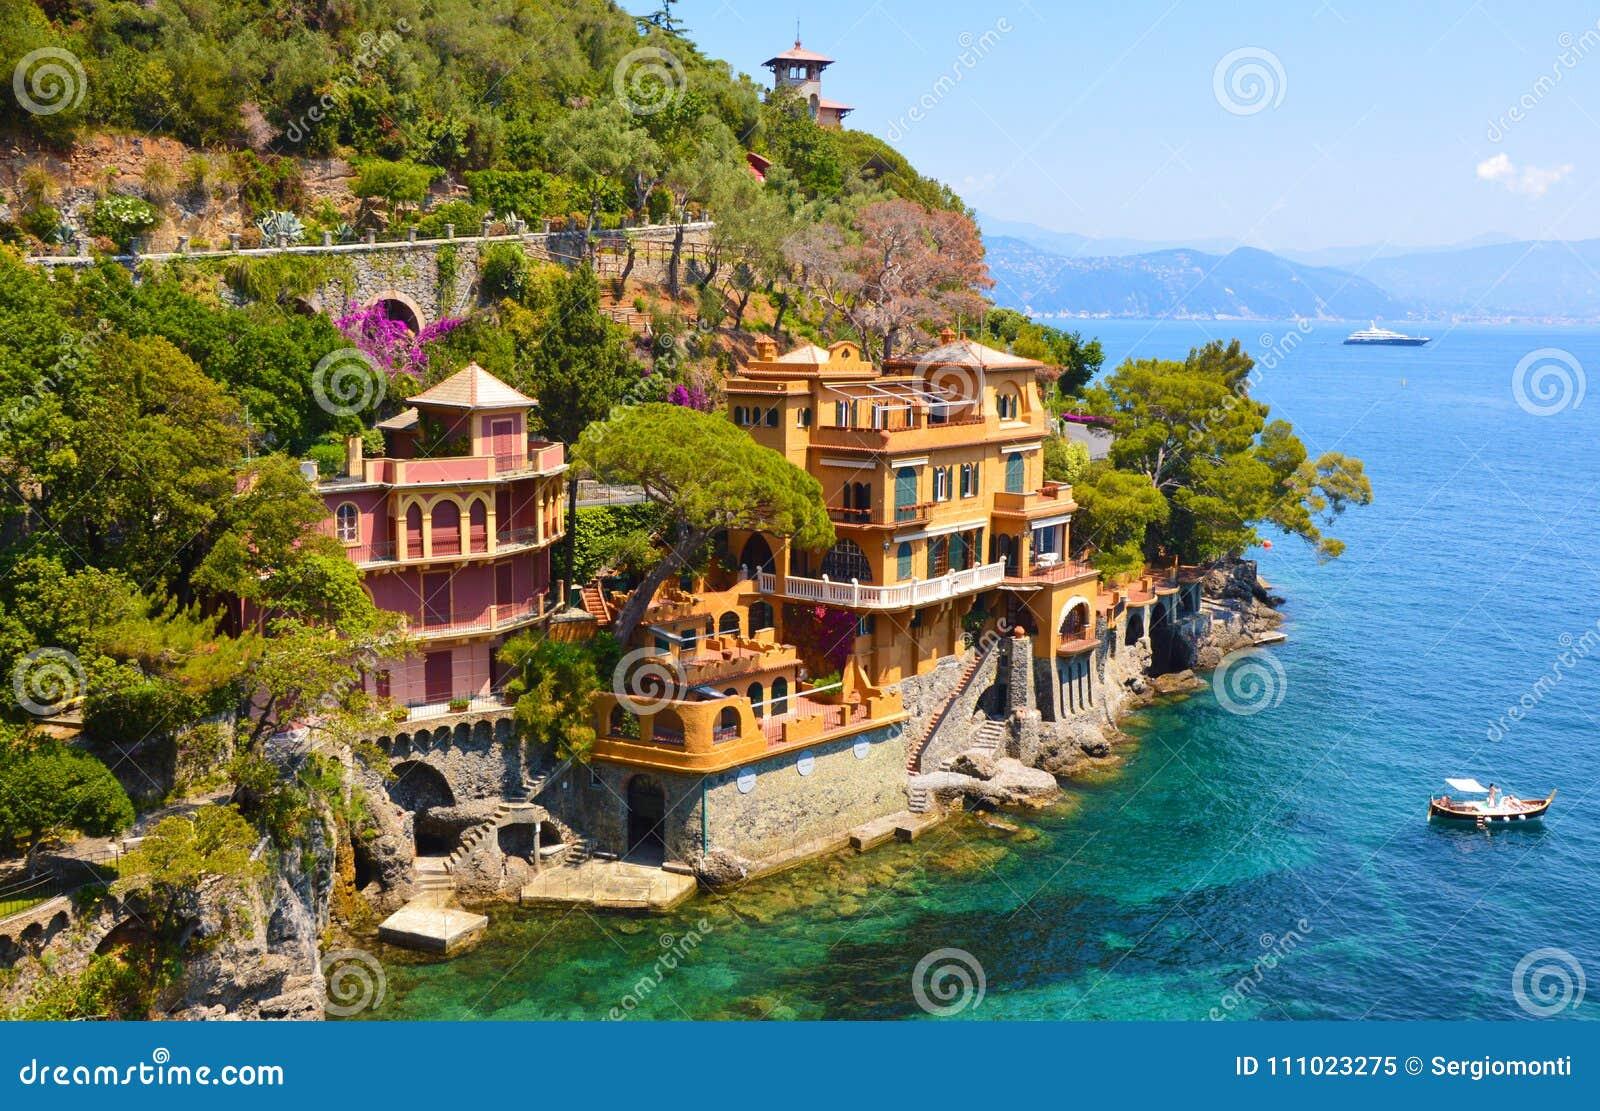 Beautiful Luxury Homes In Portofino Bay, Italy.